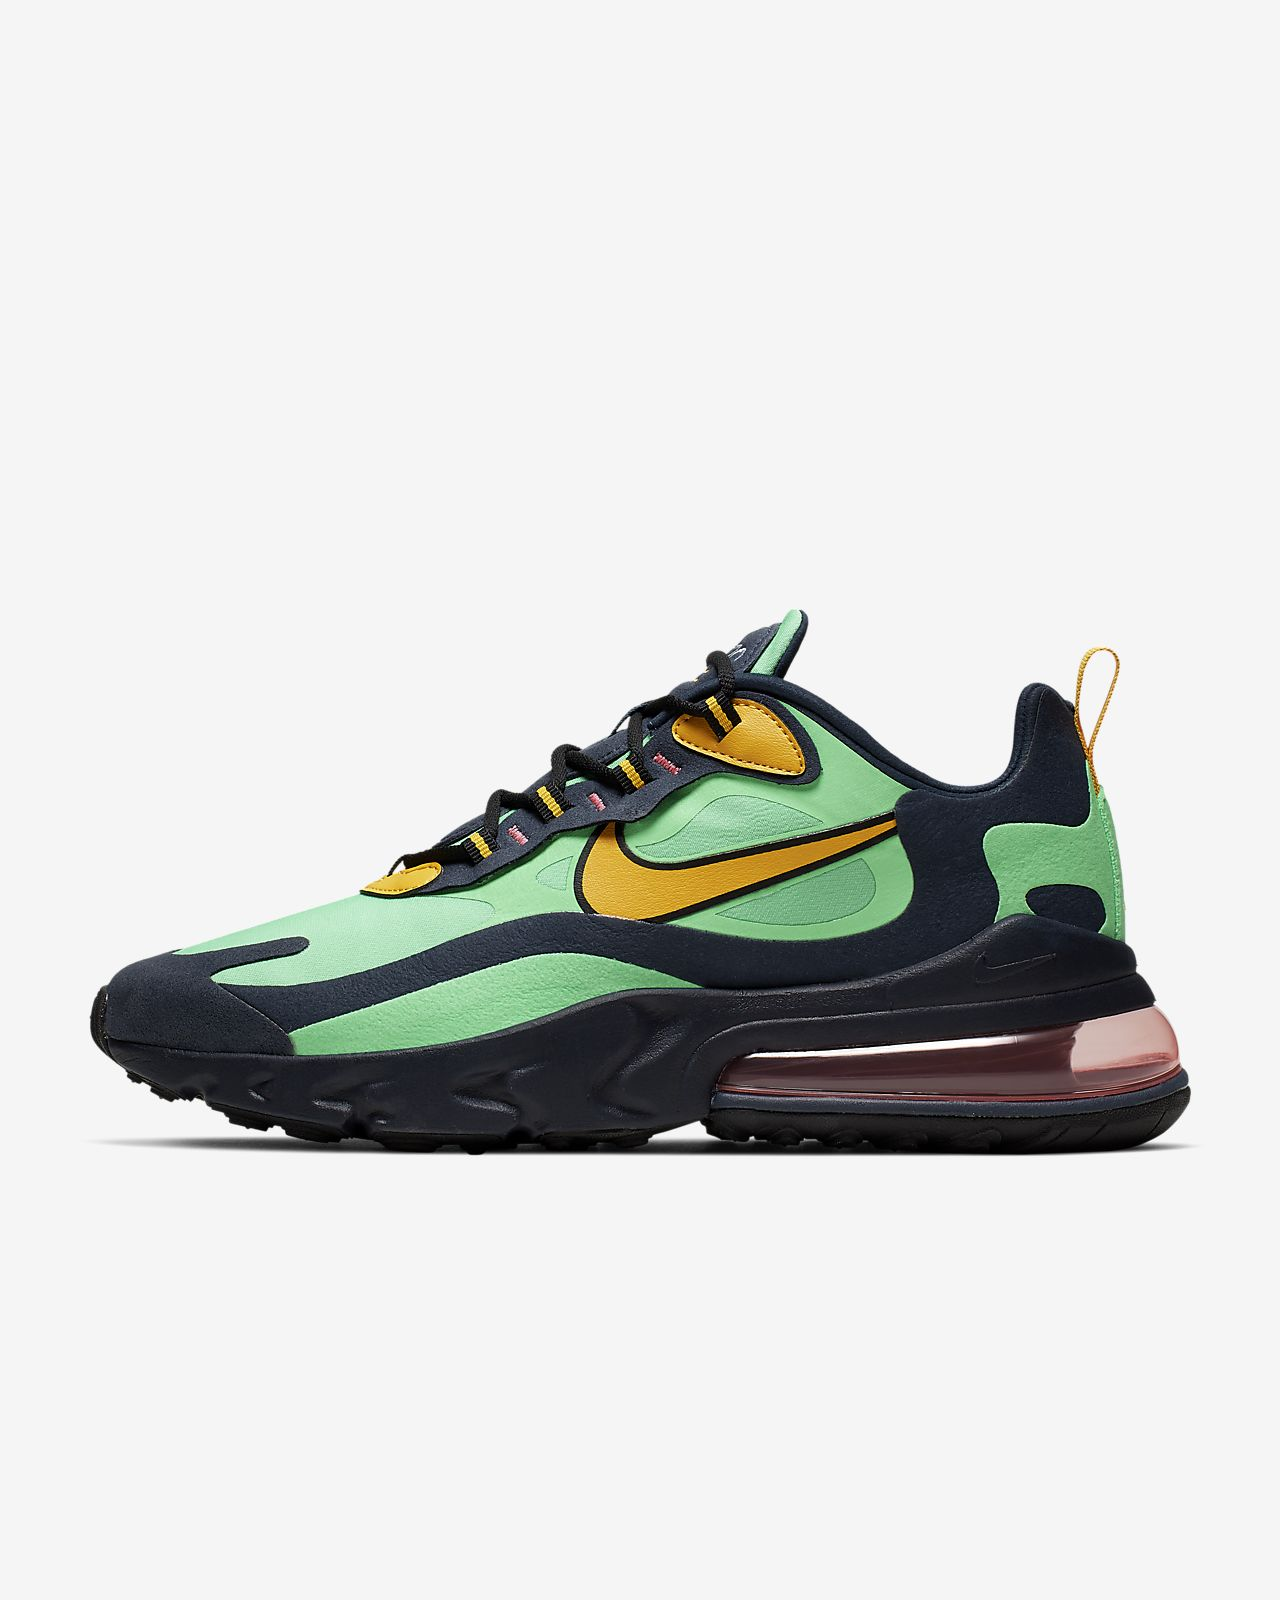 Nike Air Max 270 React (Pop Art) Erkek Ayakkabısı